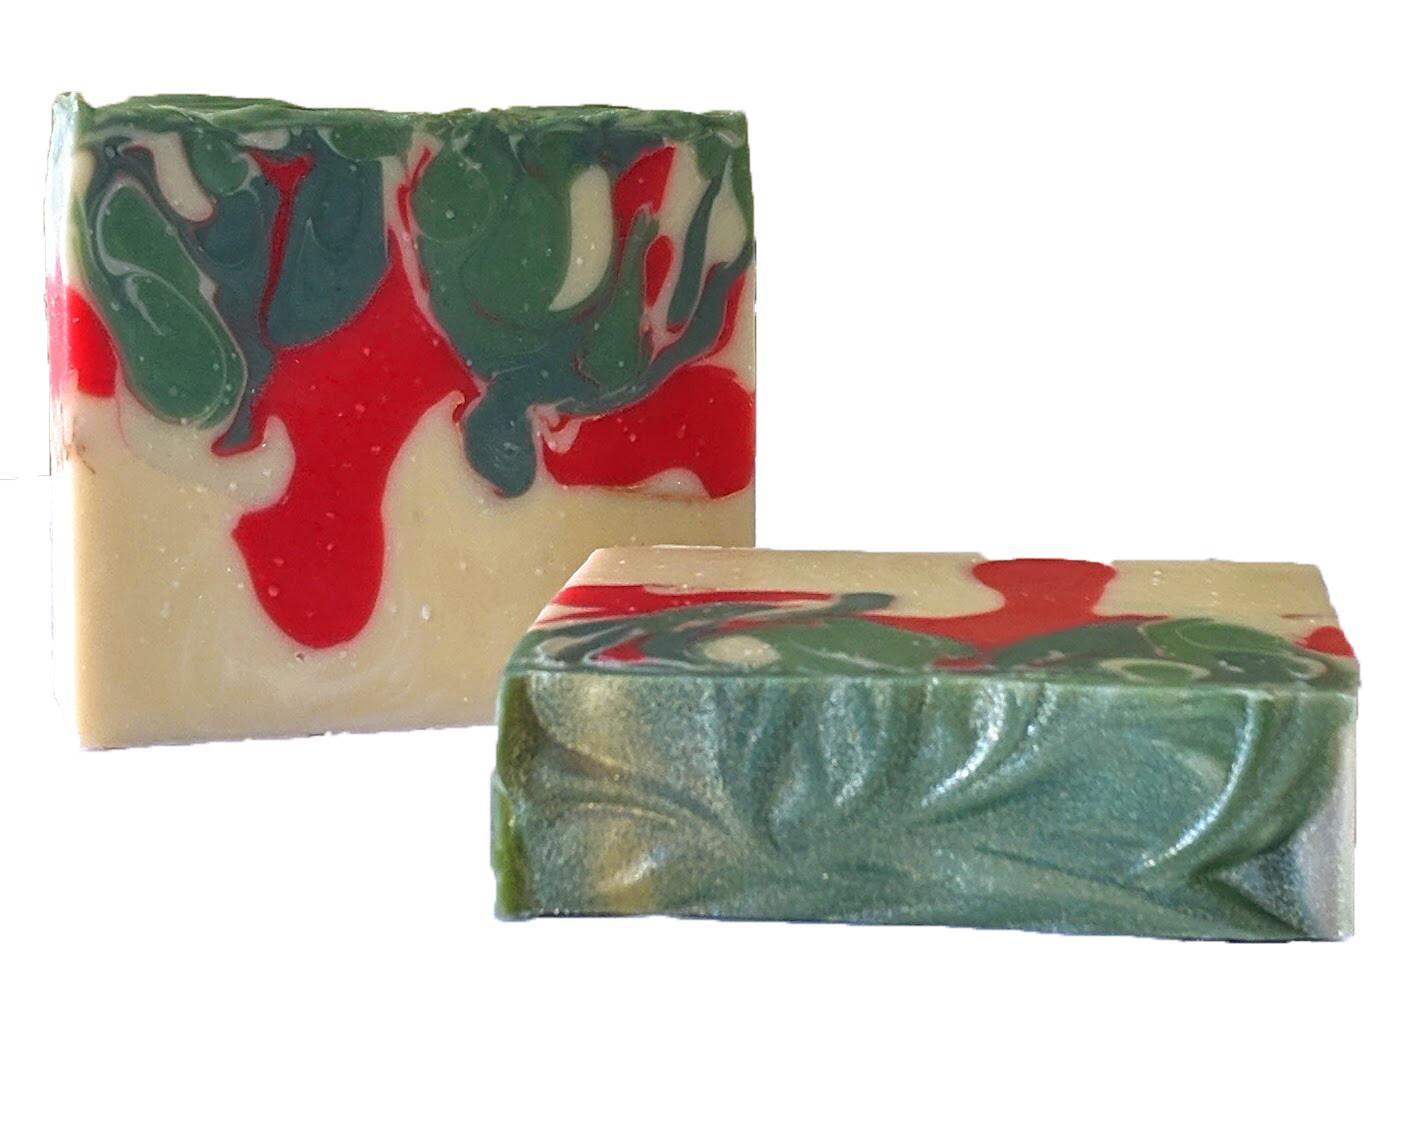 Wreaths & Ribbons - 5 oz